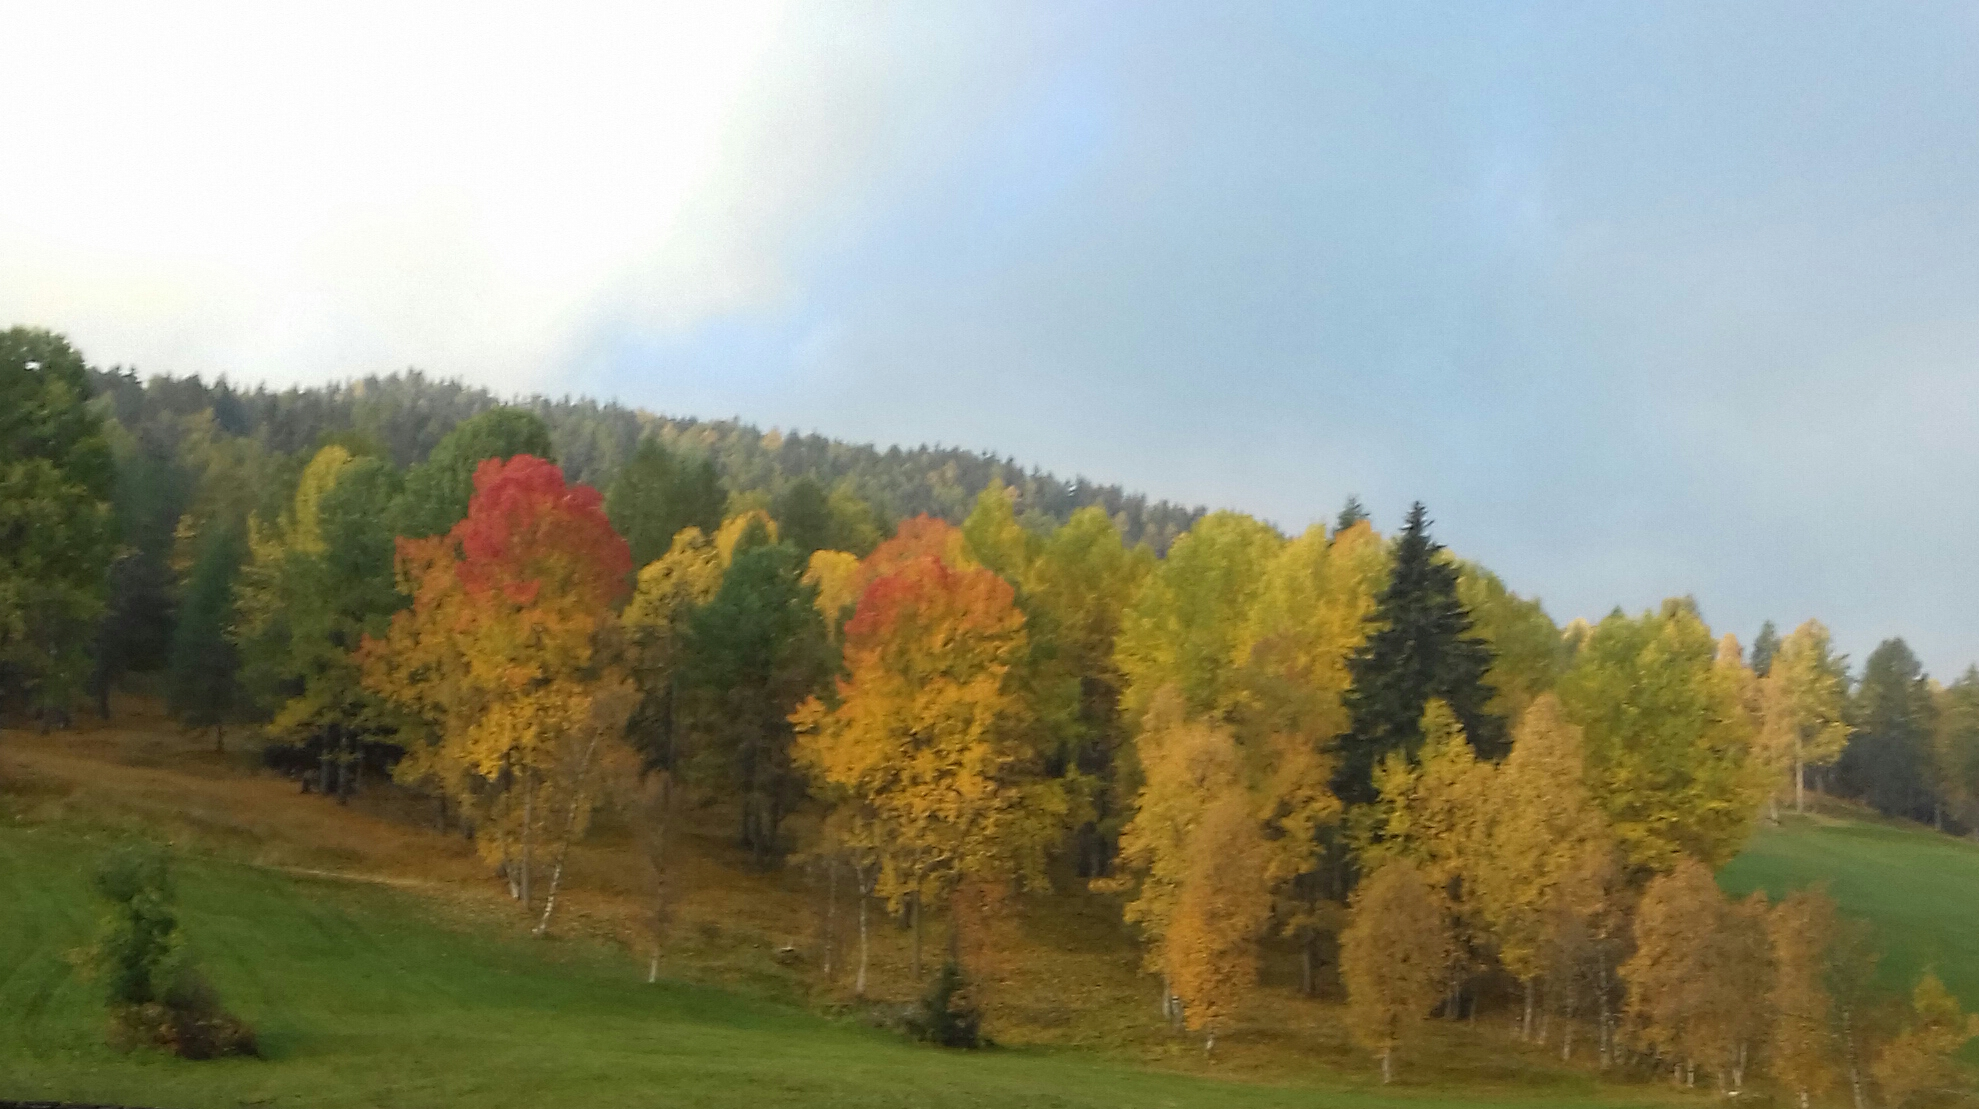 Herbstimpression oberhalb des Hauses